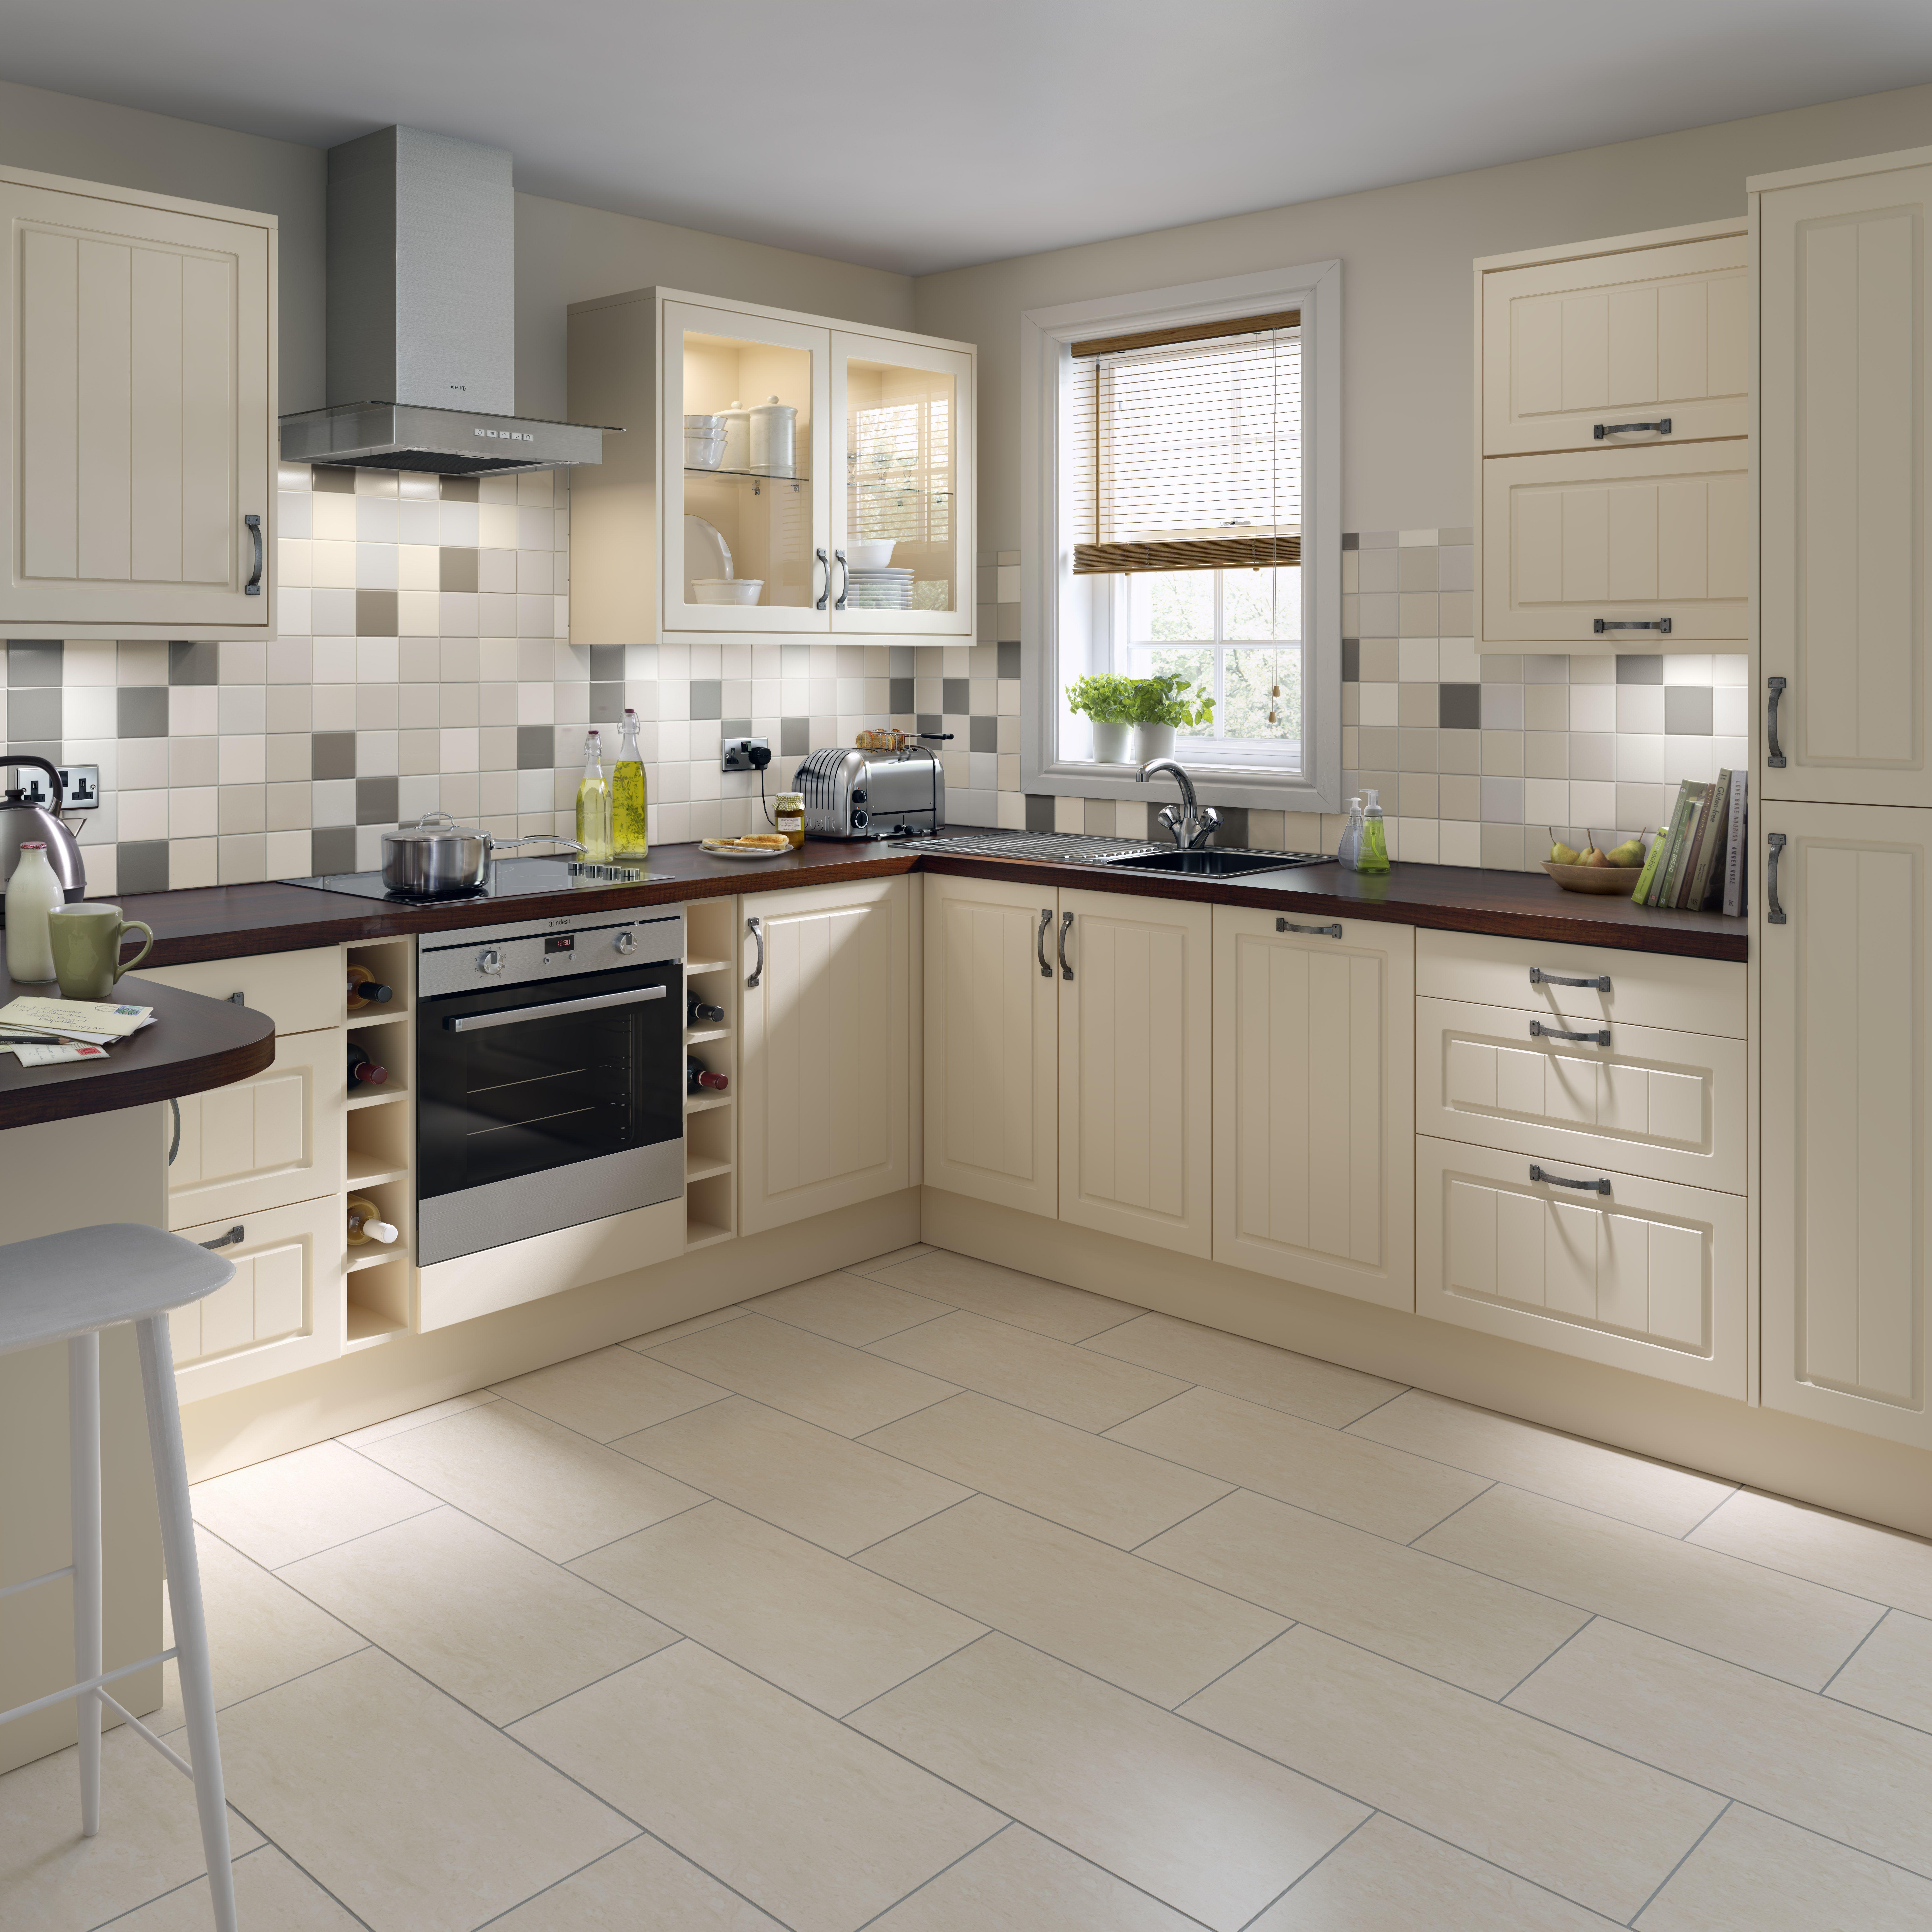 Classic farm house kitchen with matt cream doors and floor tiles ...